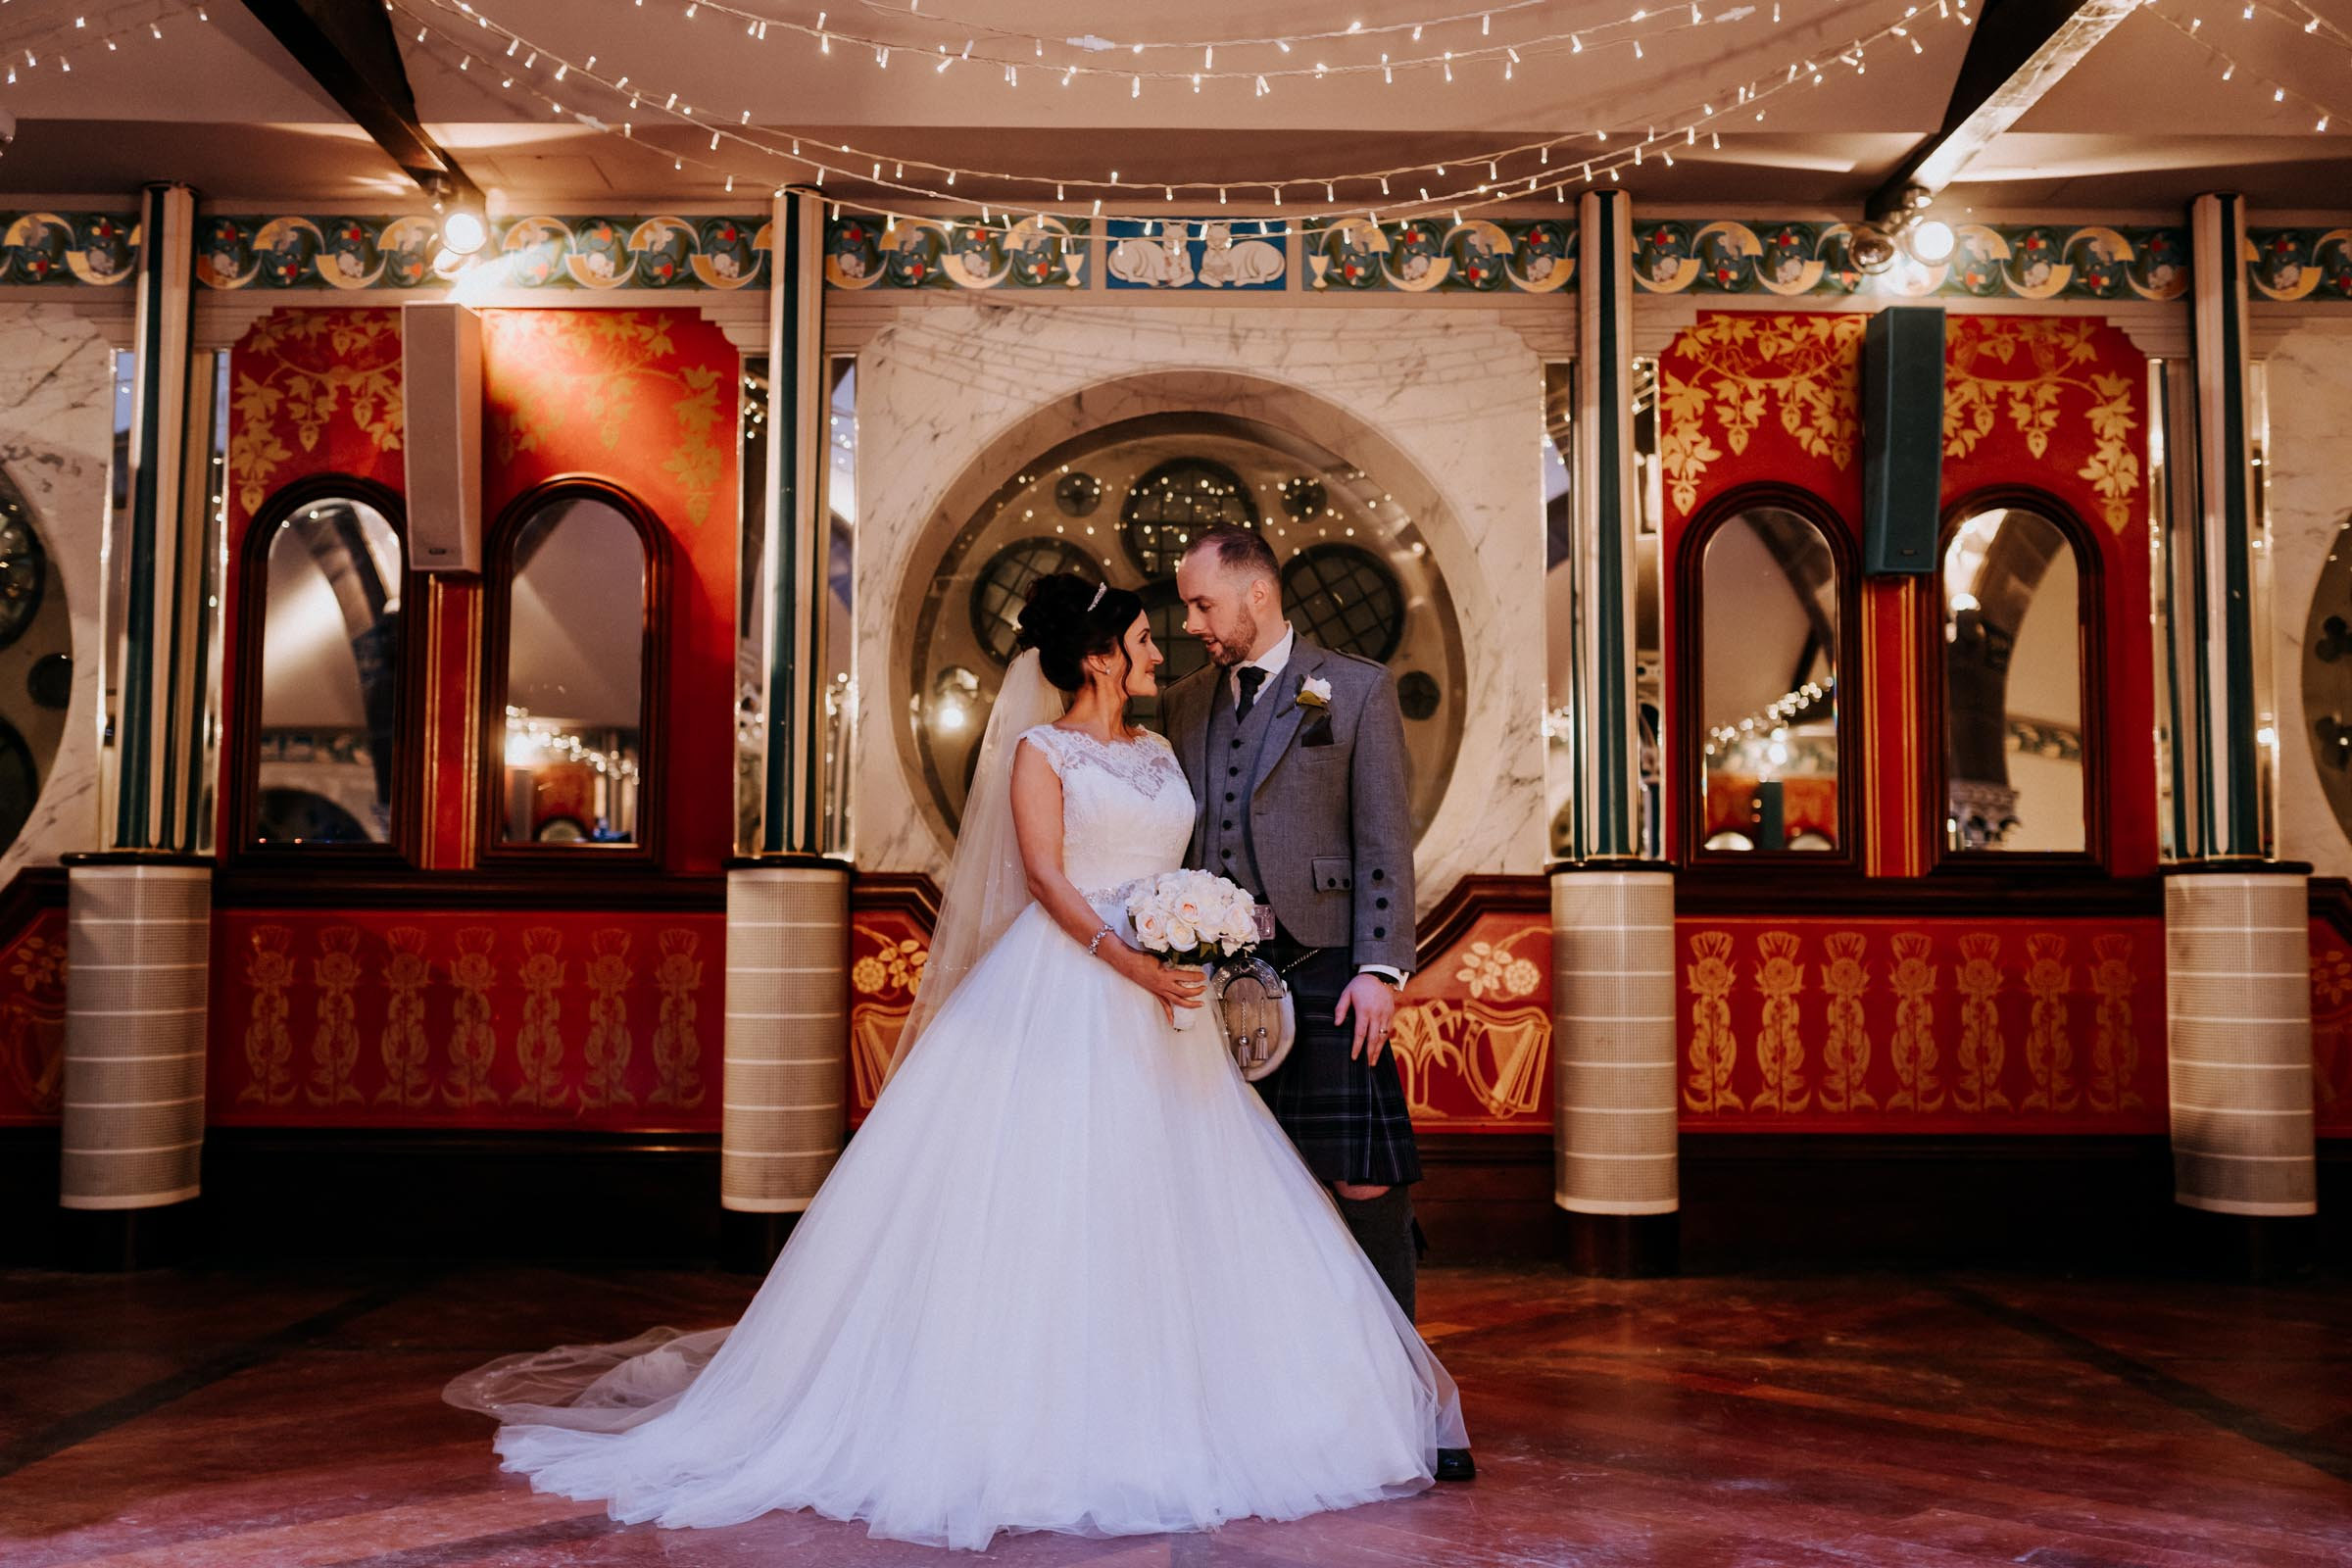 Oran-Mor-Wedding-Photographer-DearlyPhotography (25 of 55).jpg